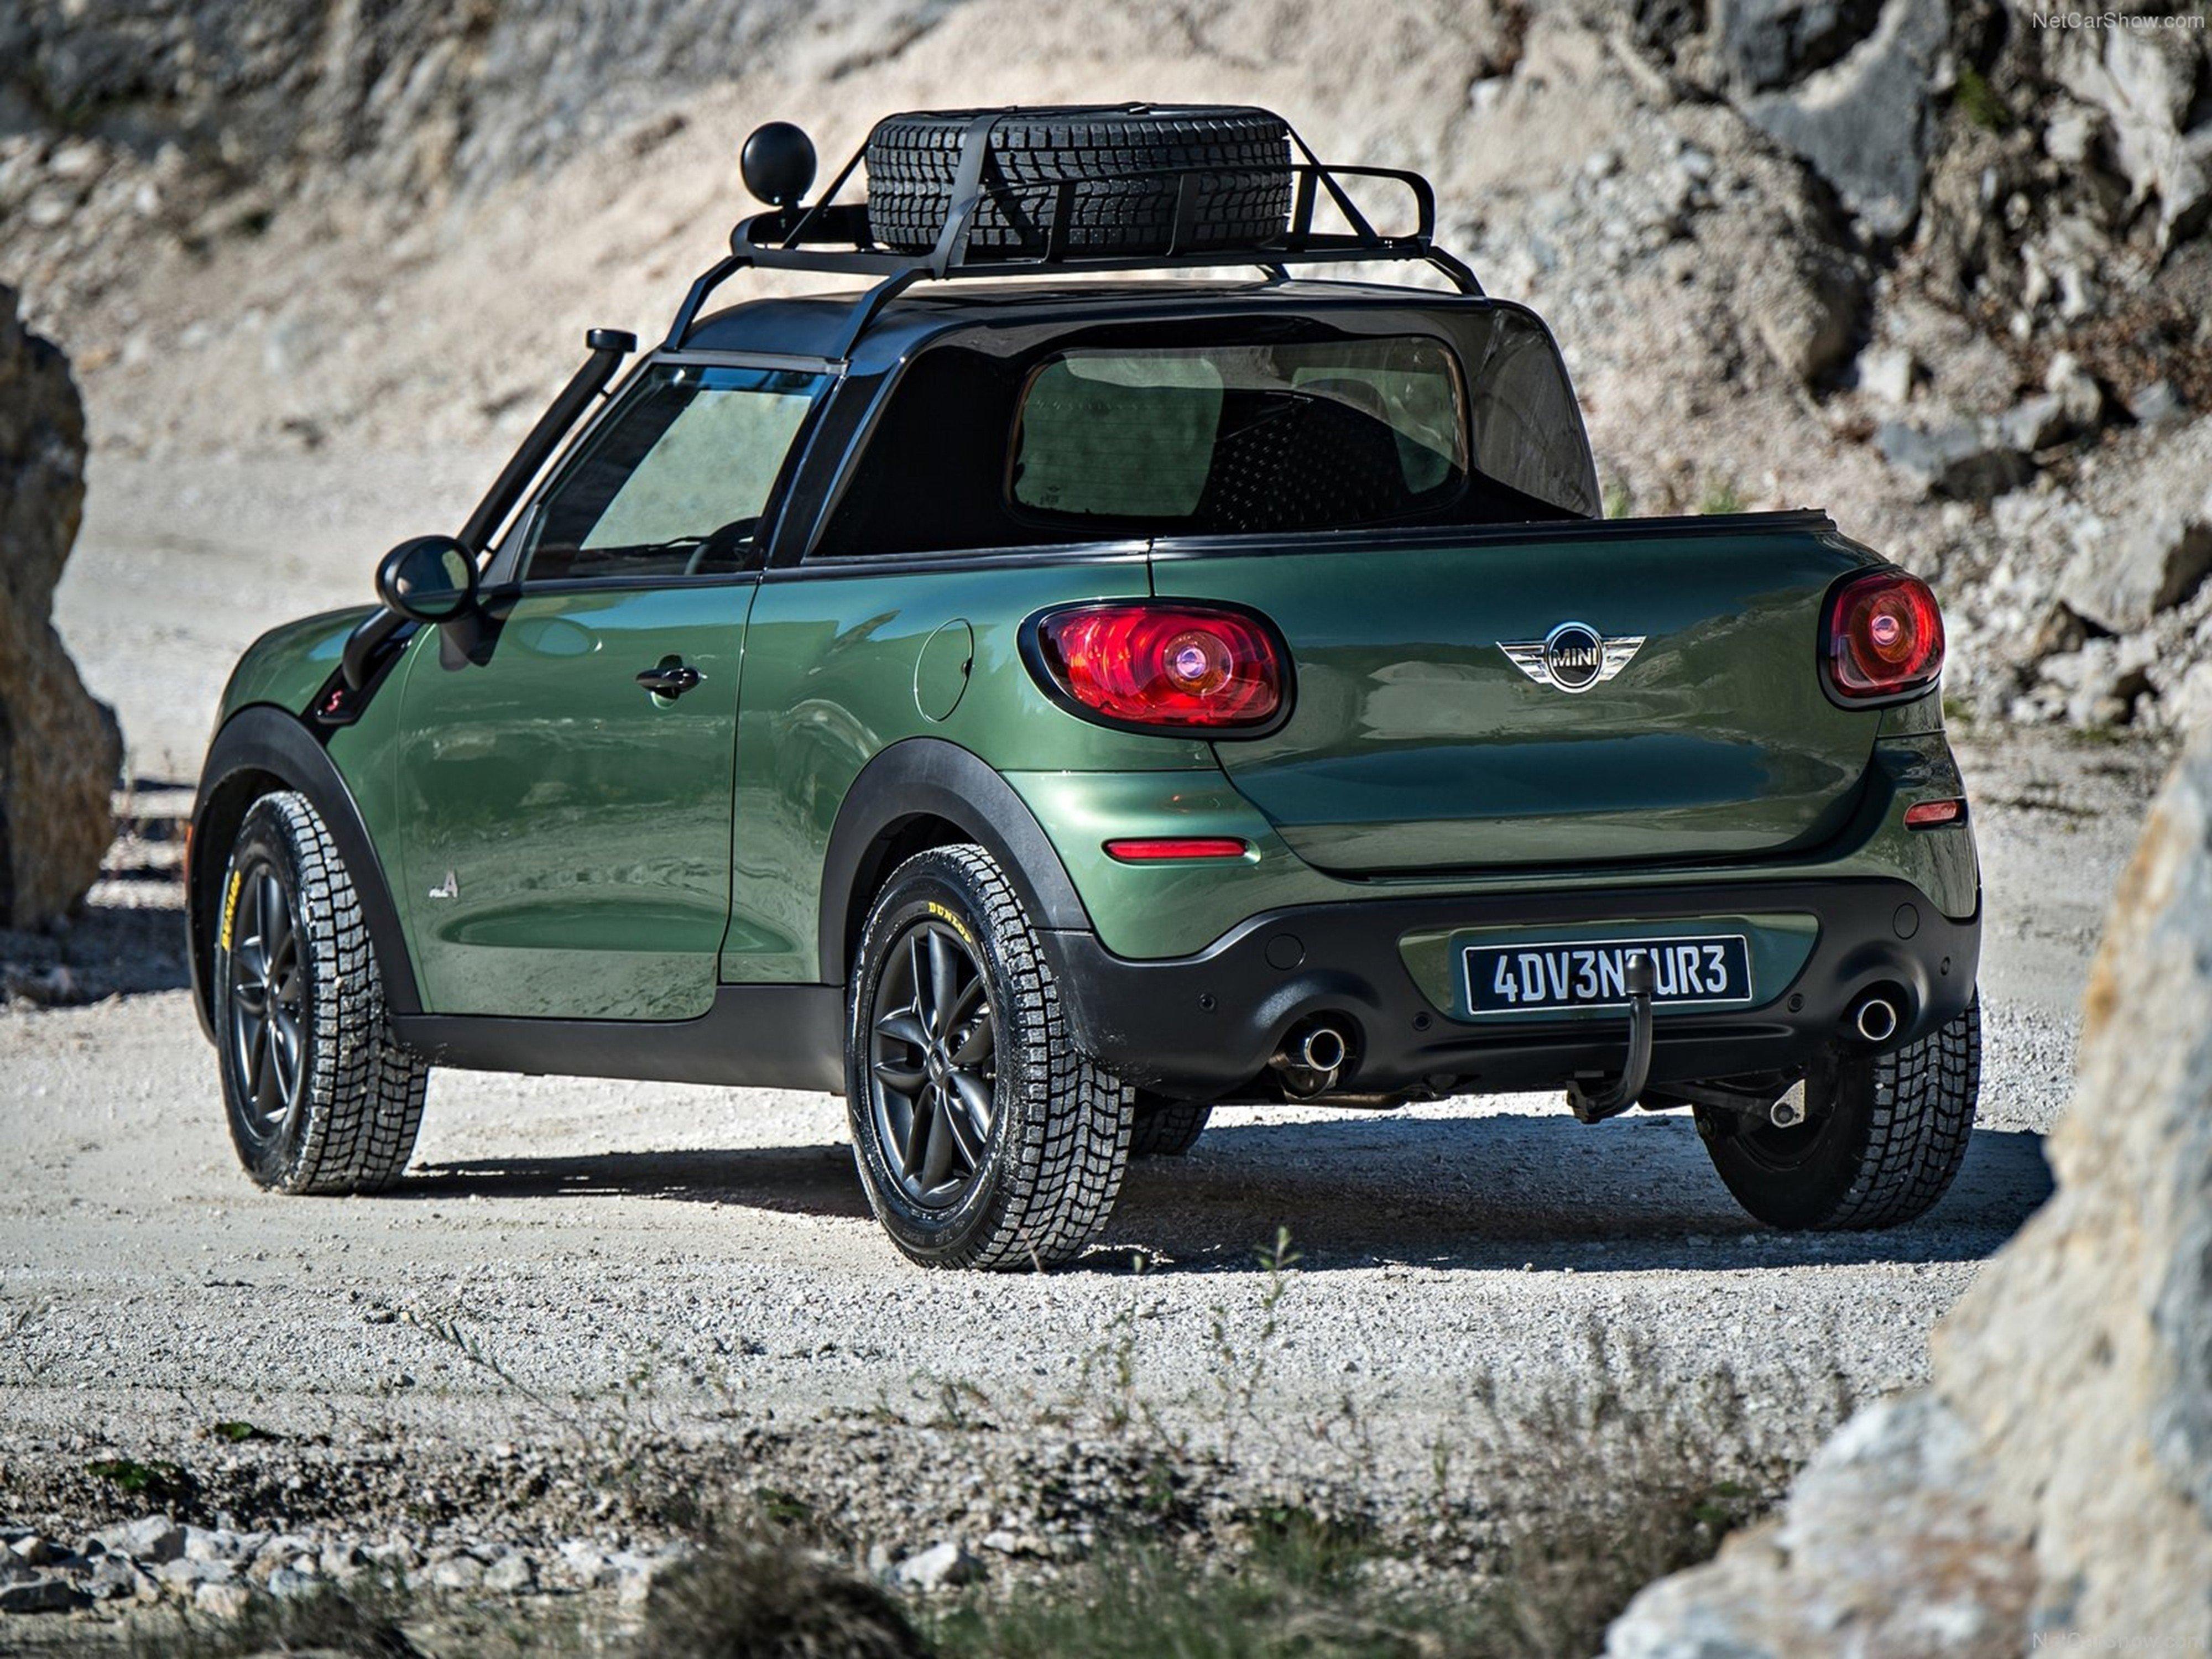 Adventure Car: Mini Paceman Adventure Concept 2014 Car 4x4 Off-Road